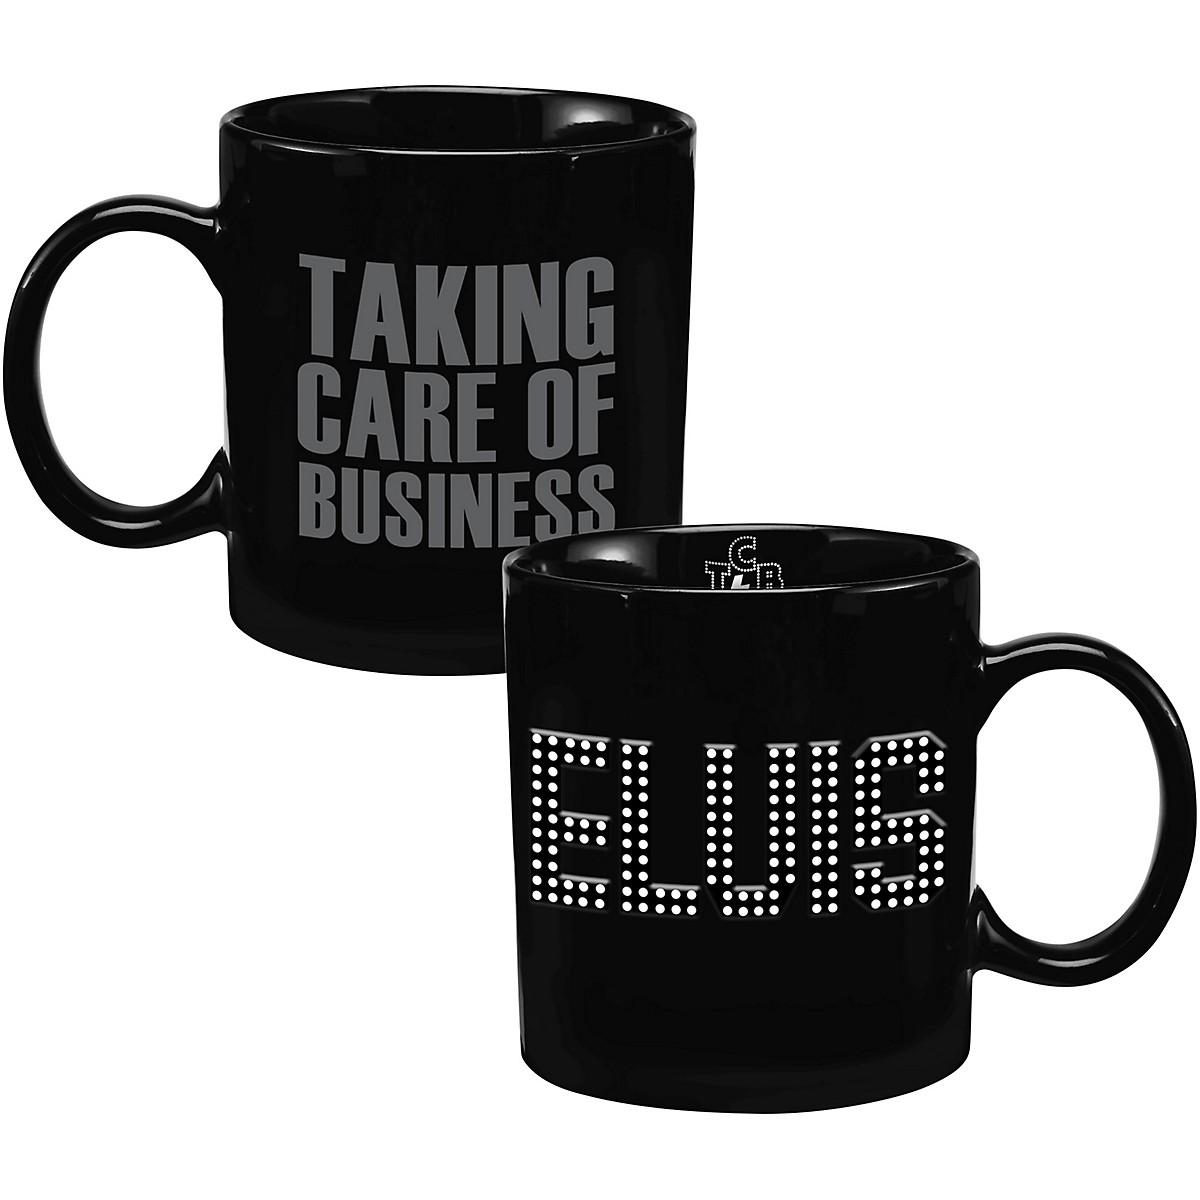 Vandor Elvis Presley Taking Care of Business 20 oz. Ceramic Mug